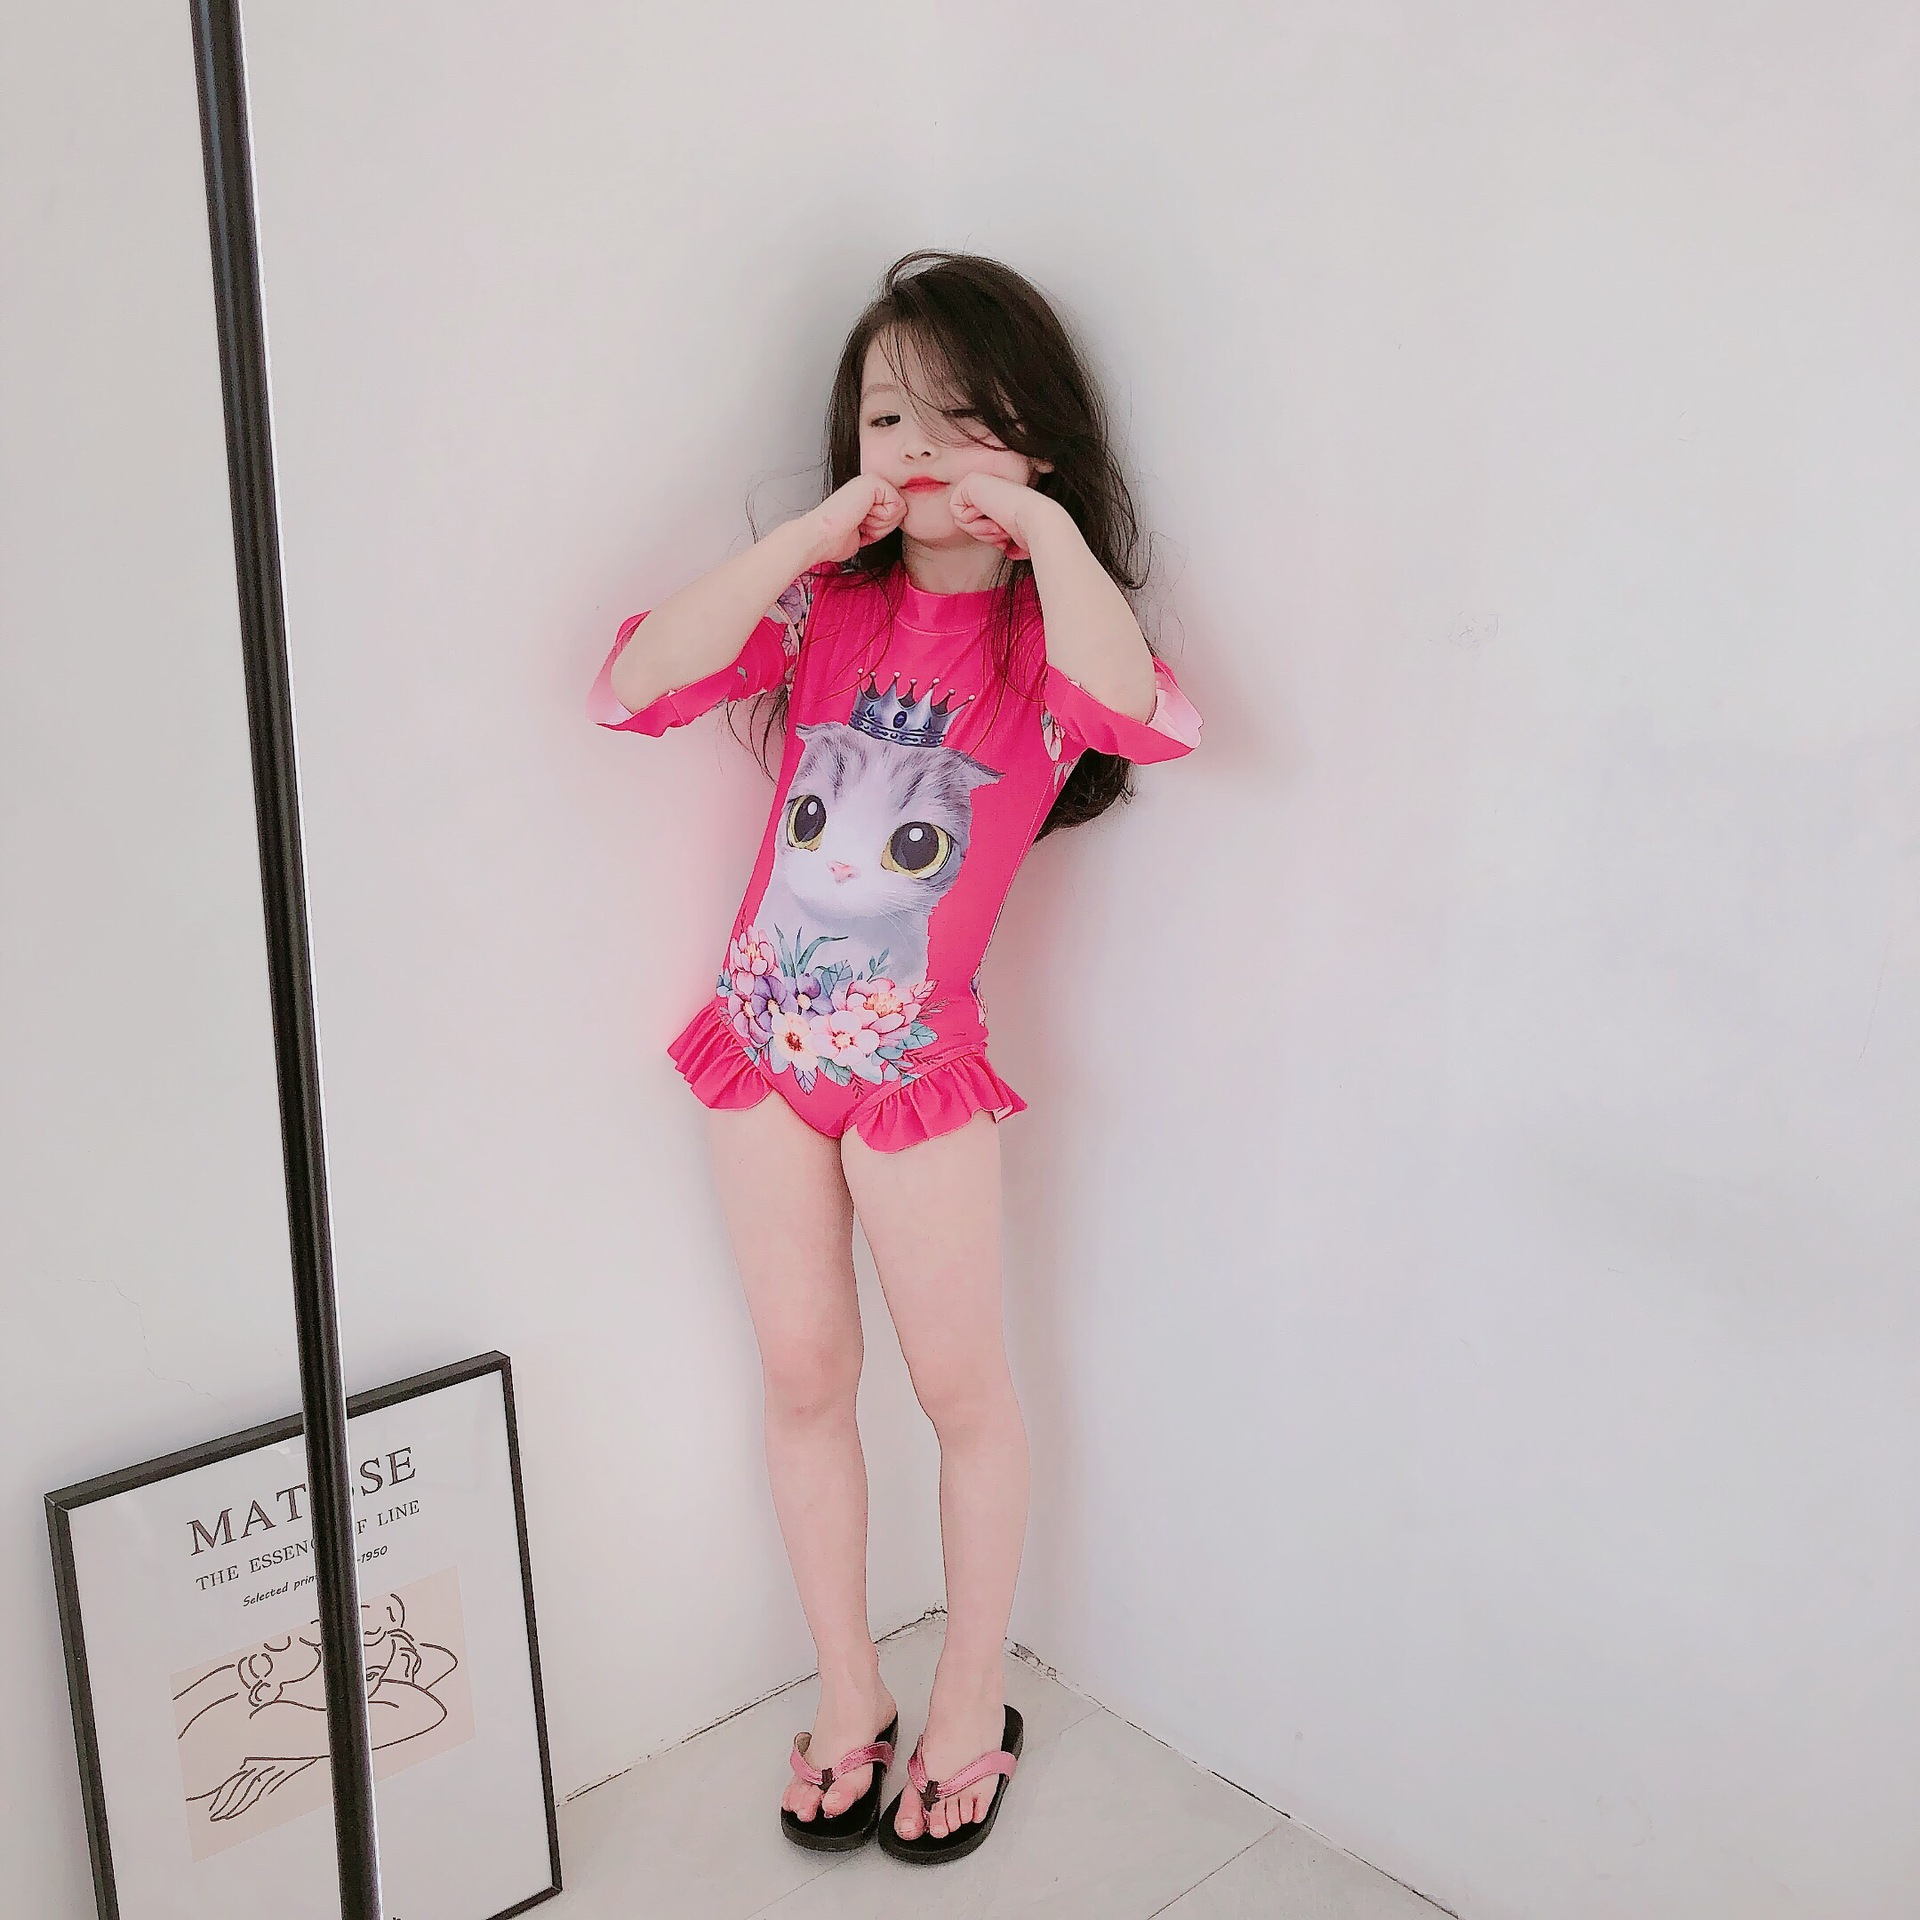 UV Baby Girls Kids Cute Long Sleeve Cat Swimsuit Rash Guard Bathing Suit UPF 50